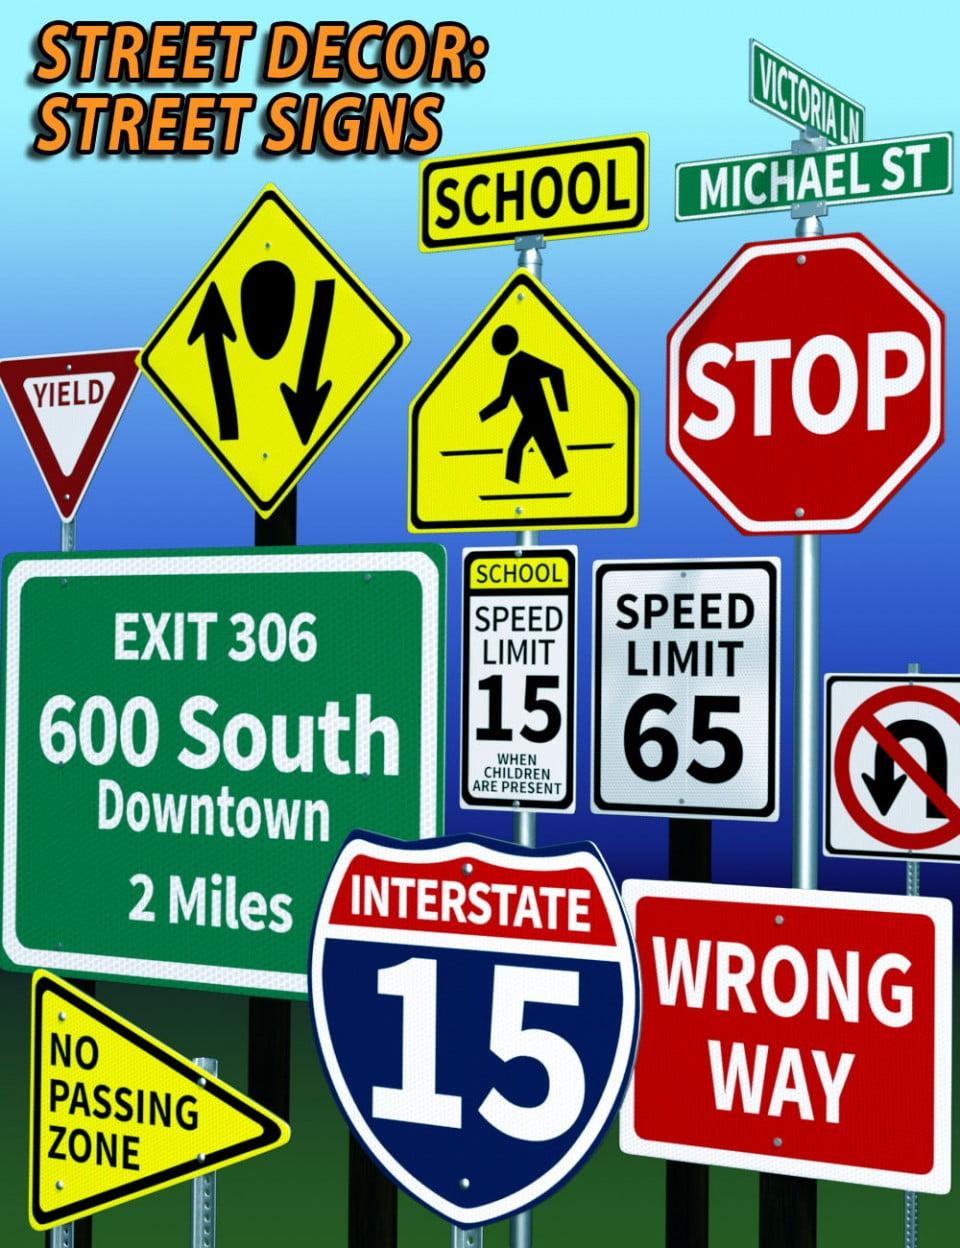 Street Decor - Street Signs